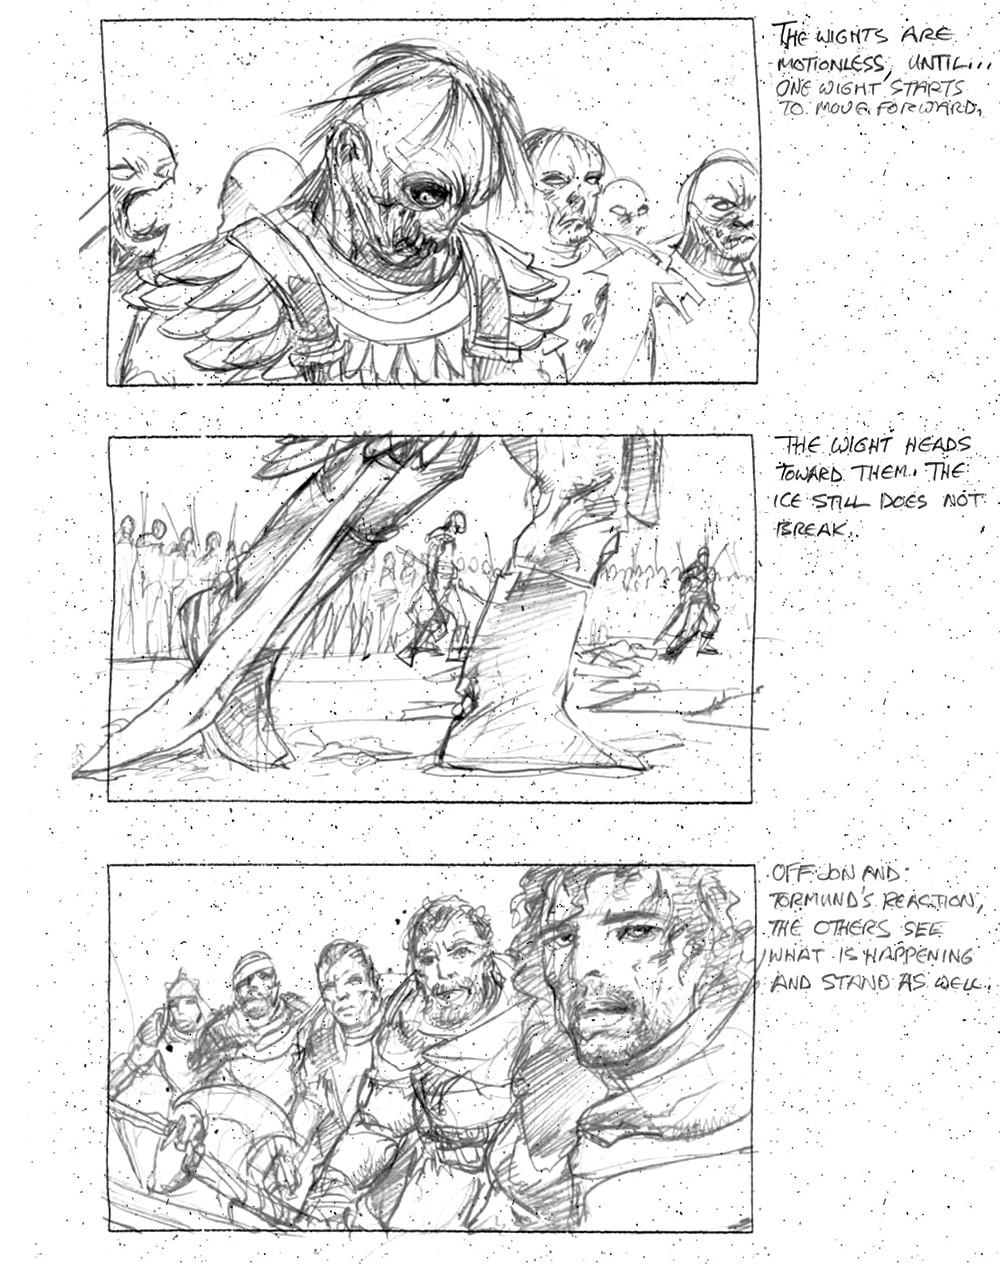 got_s7_ep06_mgot_storyboards_wightArmy_02.jpg